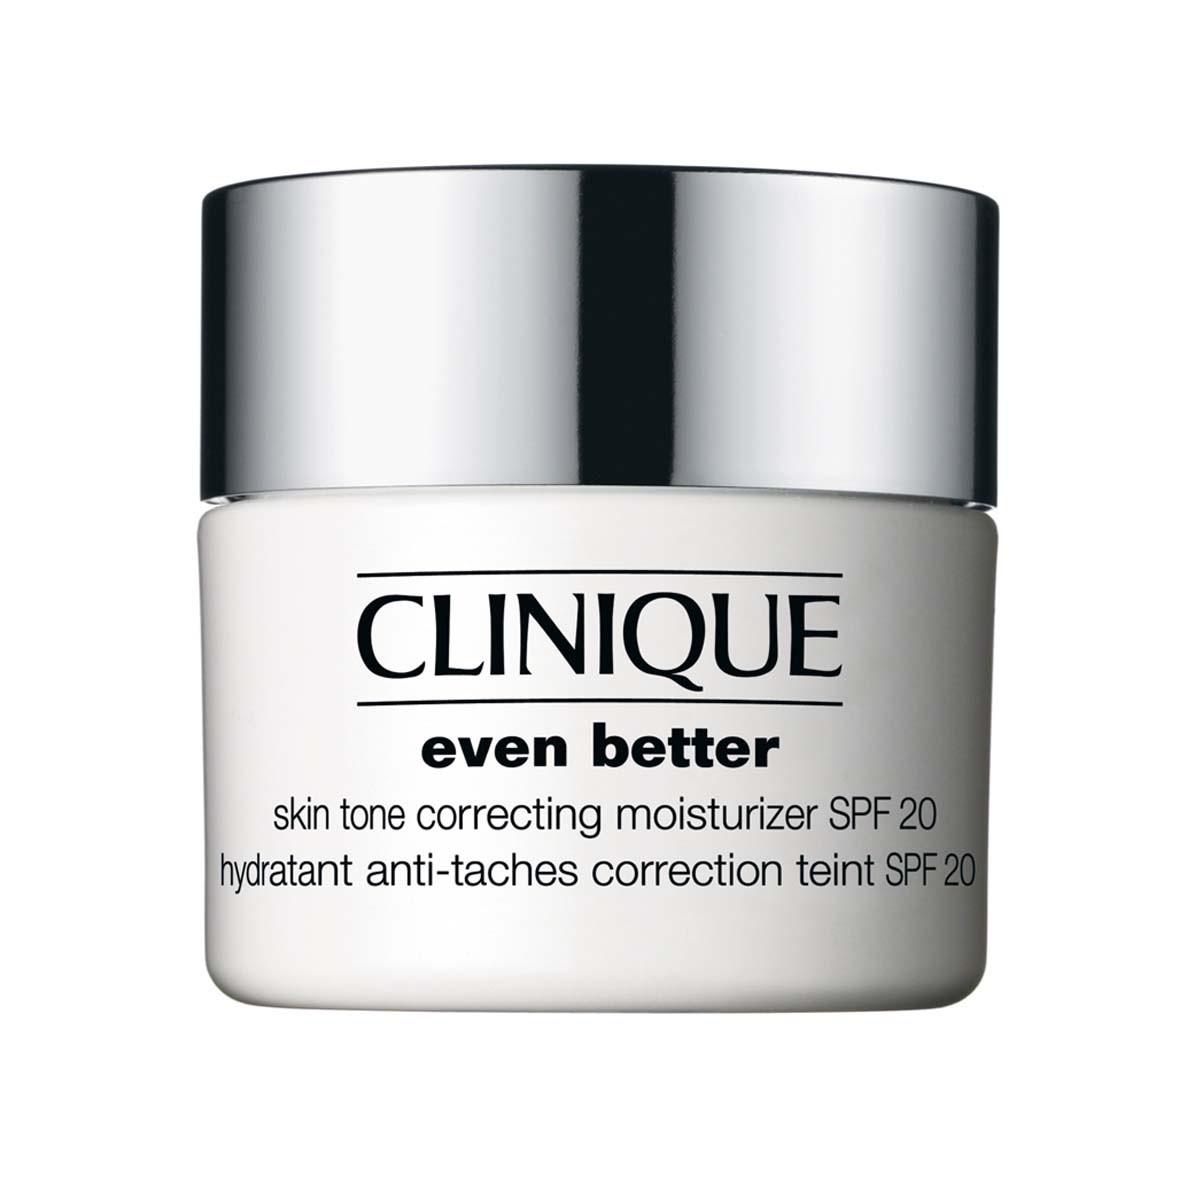 Clinique even better skin tone correcting moisturizer spf 20, Verde, large image number 0